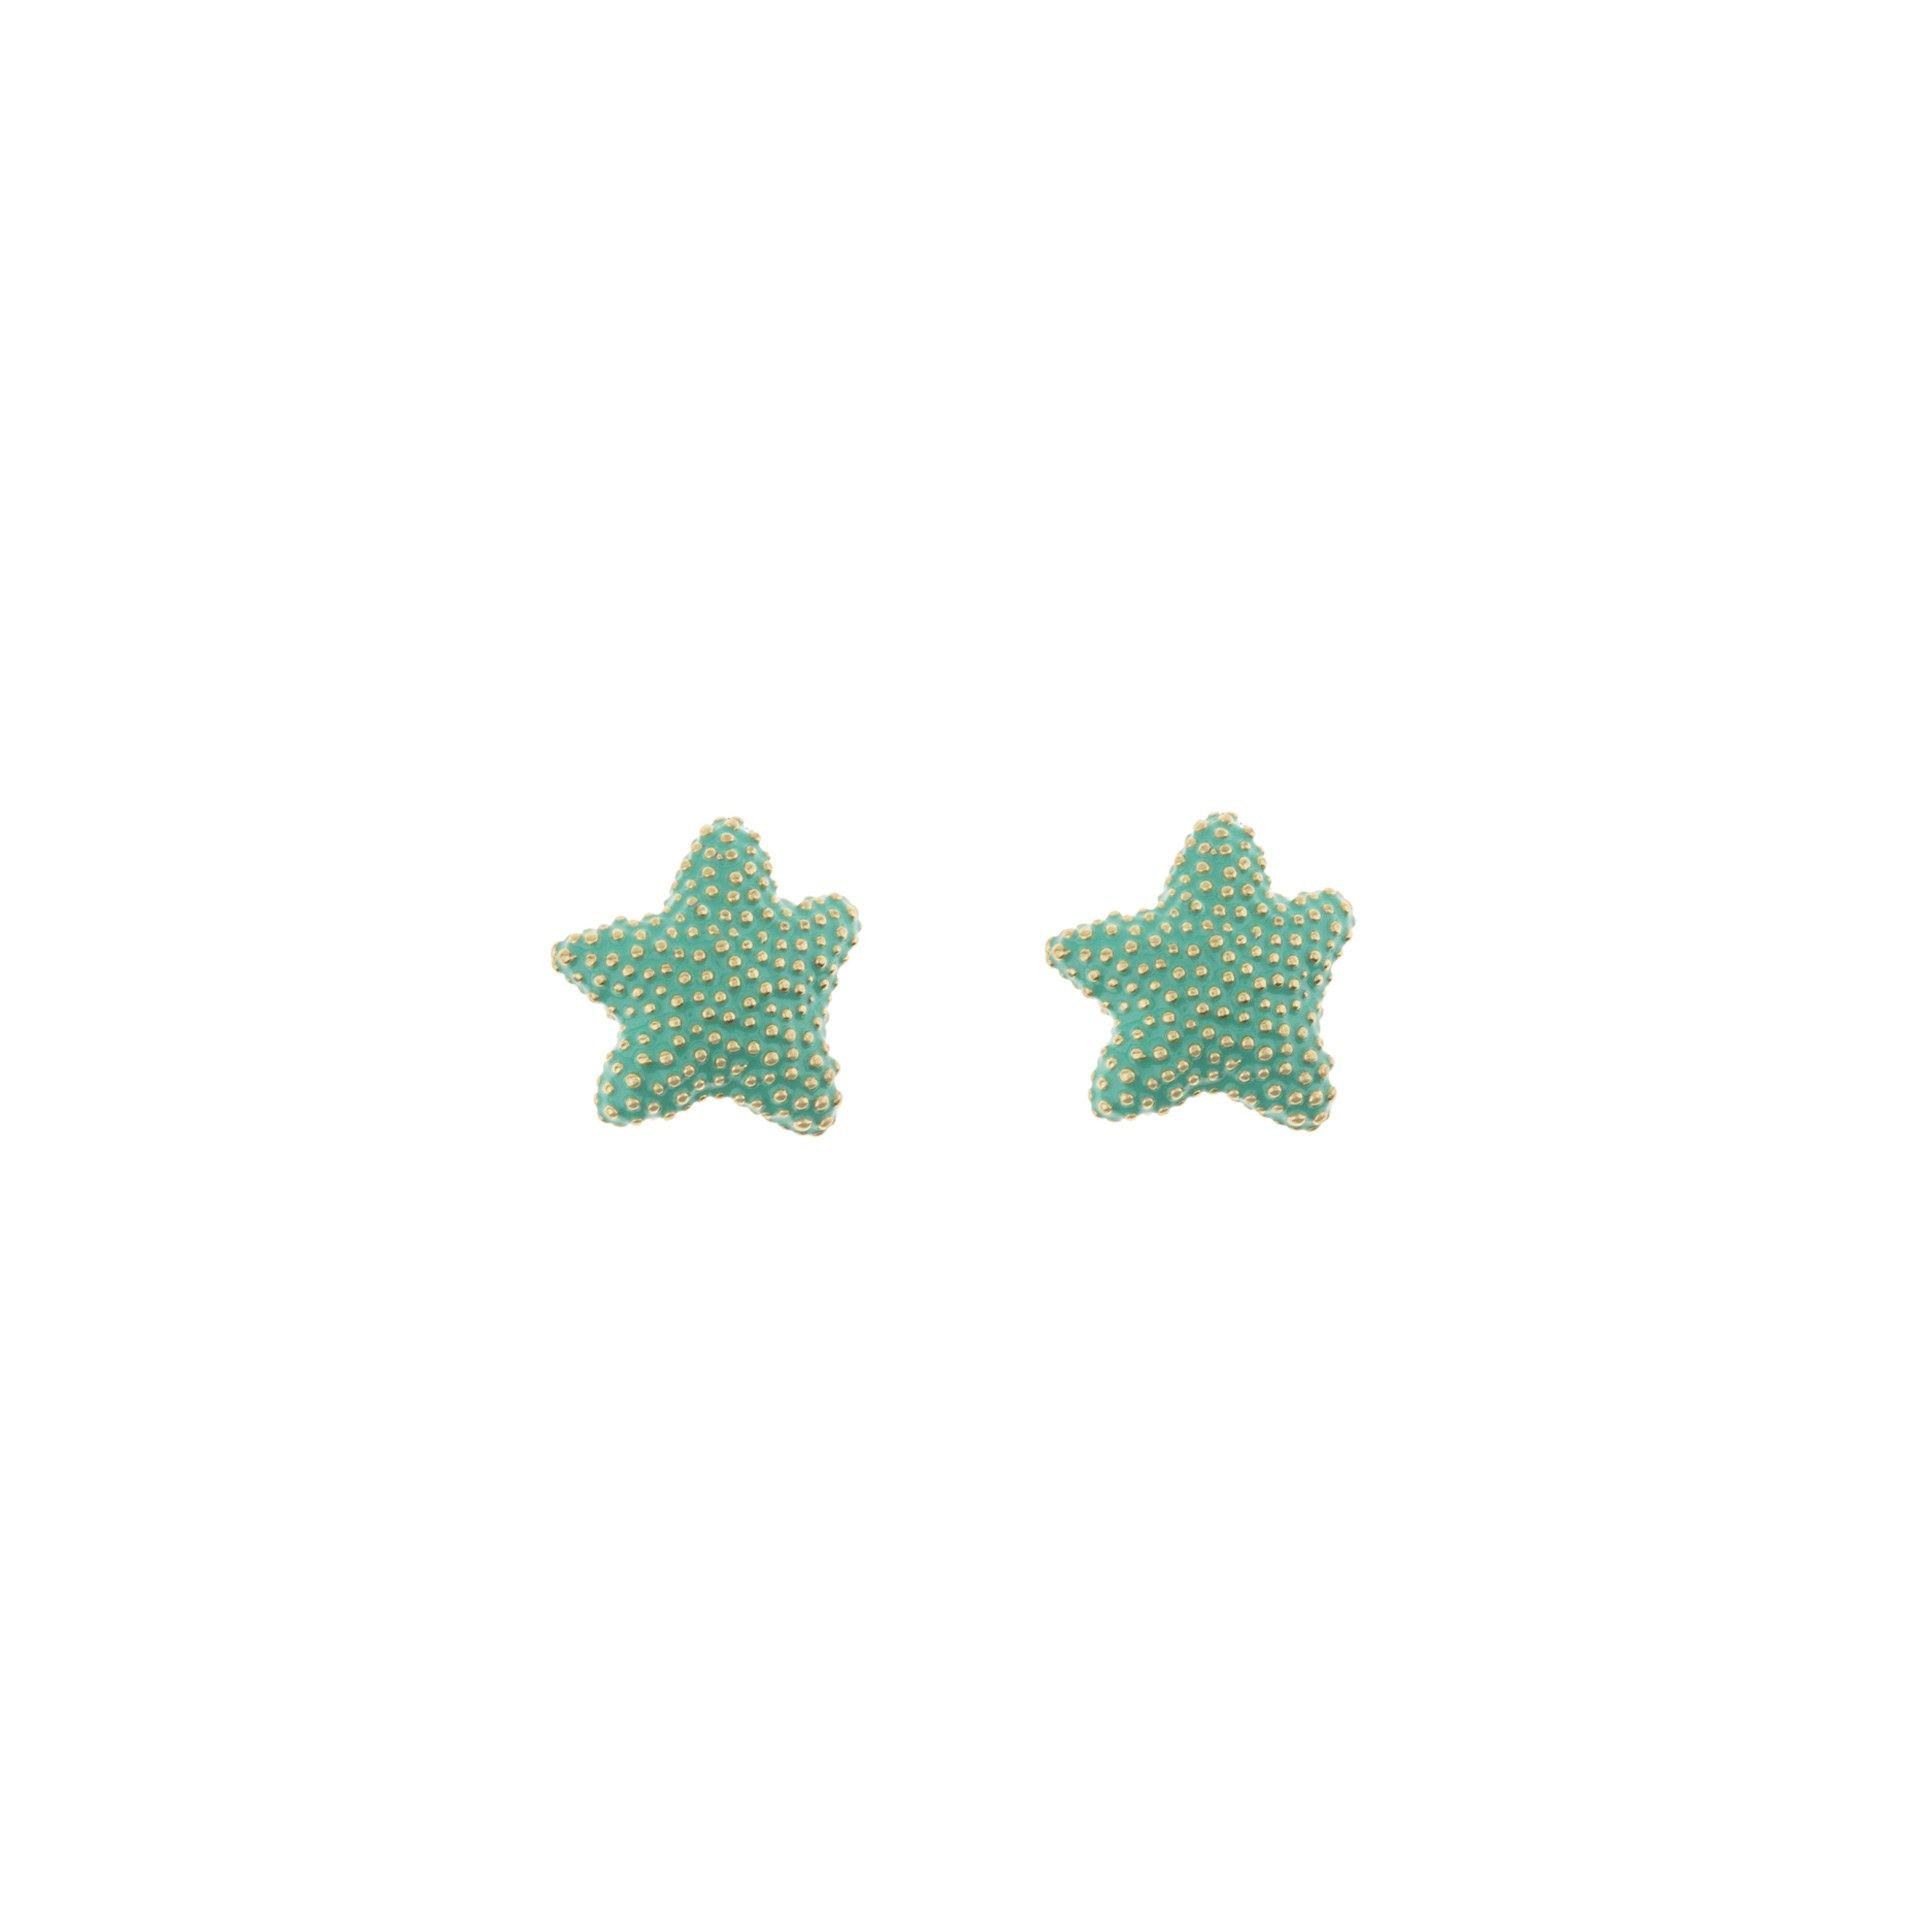 30183b3572aa Green stars - Costa Chic Collection - Bimba y Lola